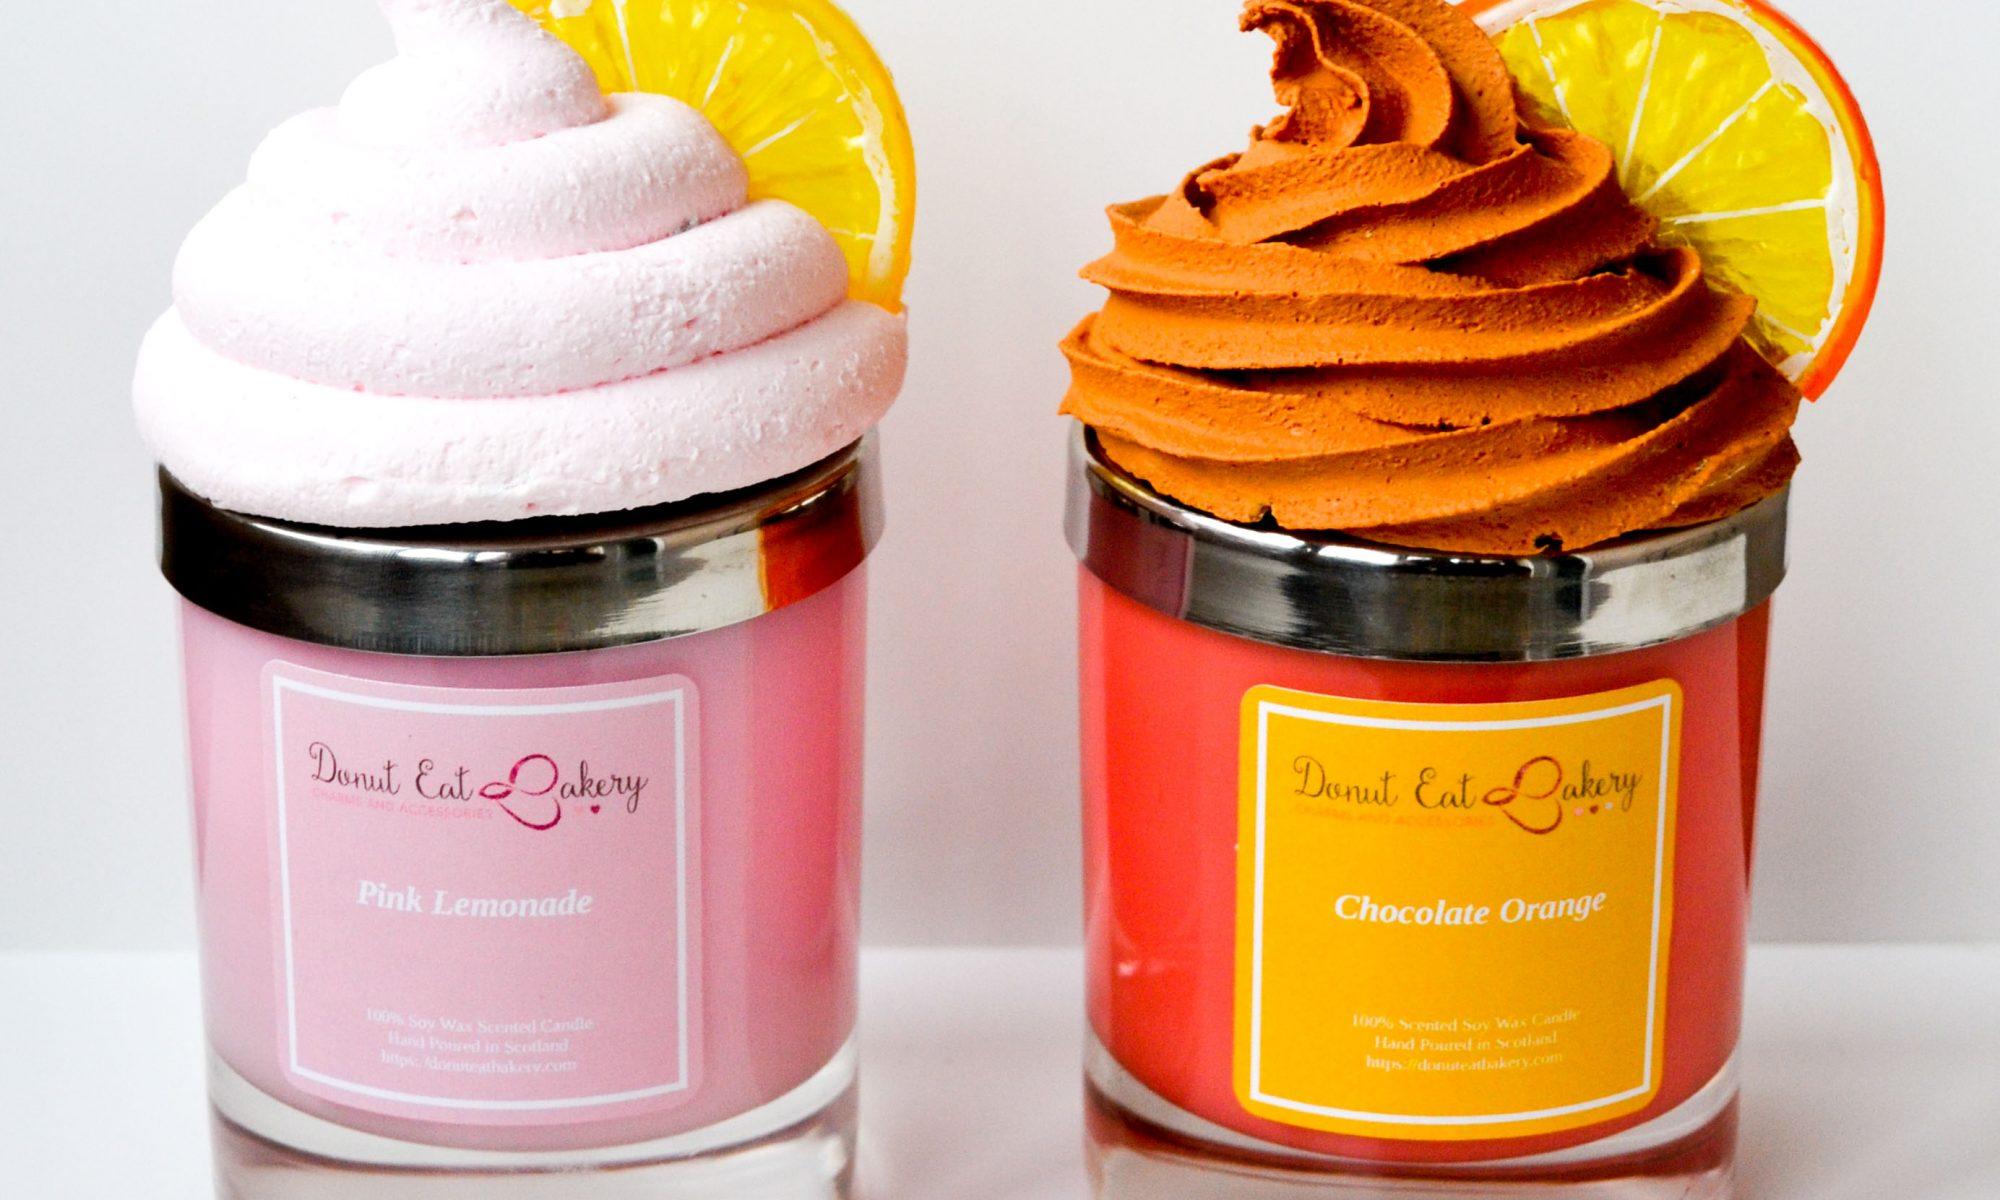 Pink Lemonade Cupcake Candle